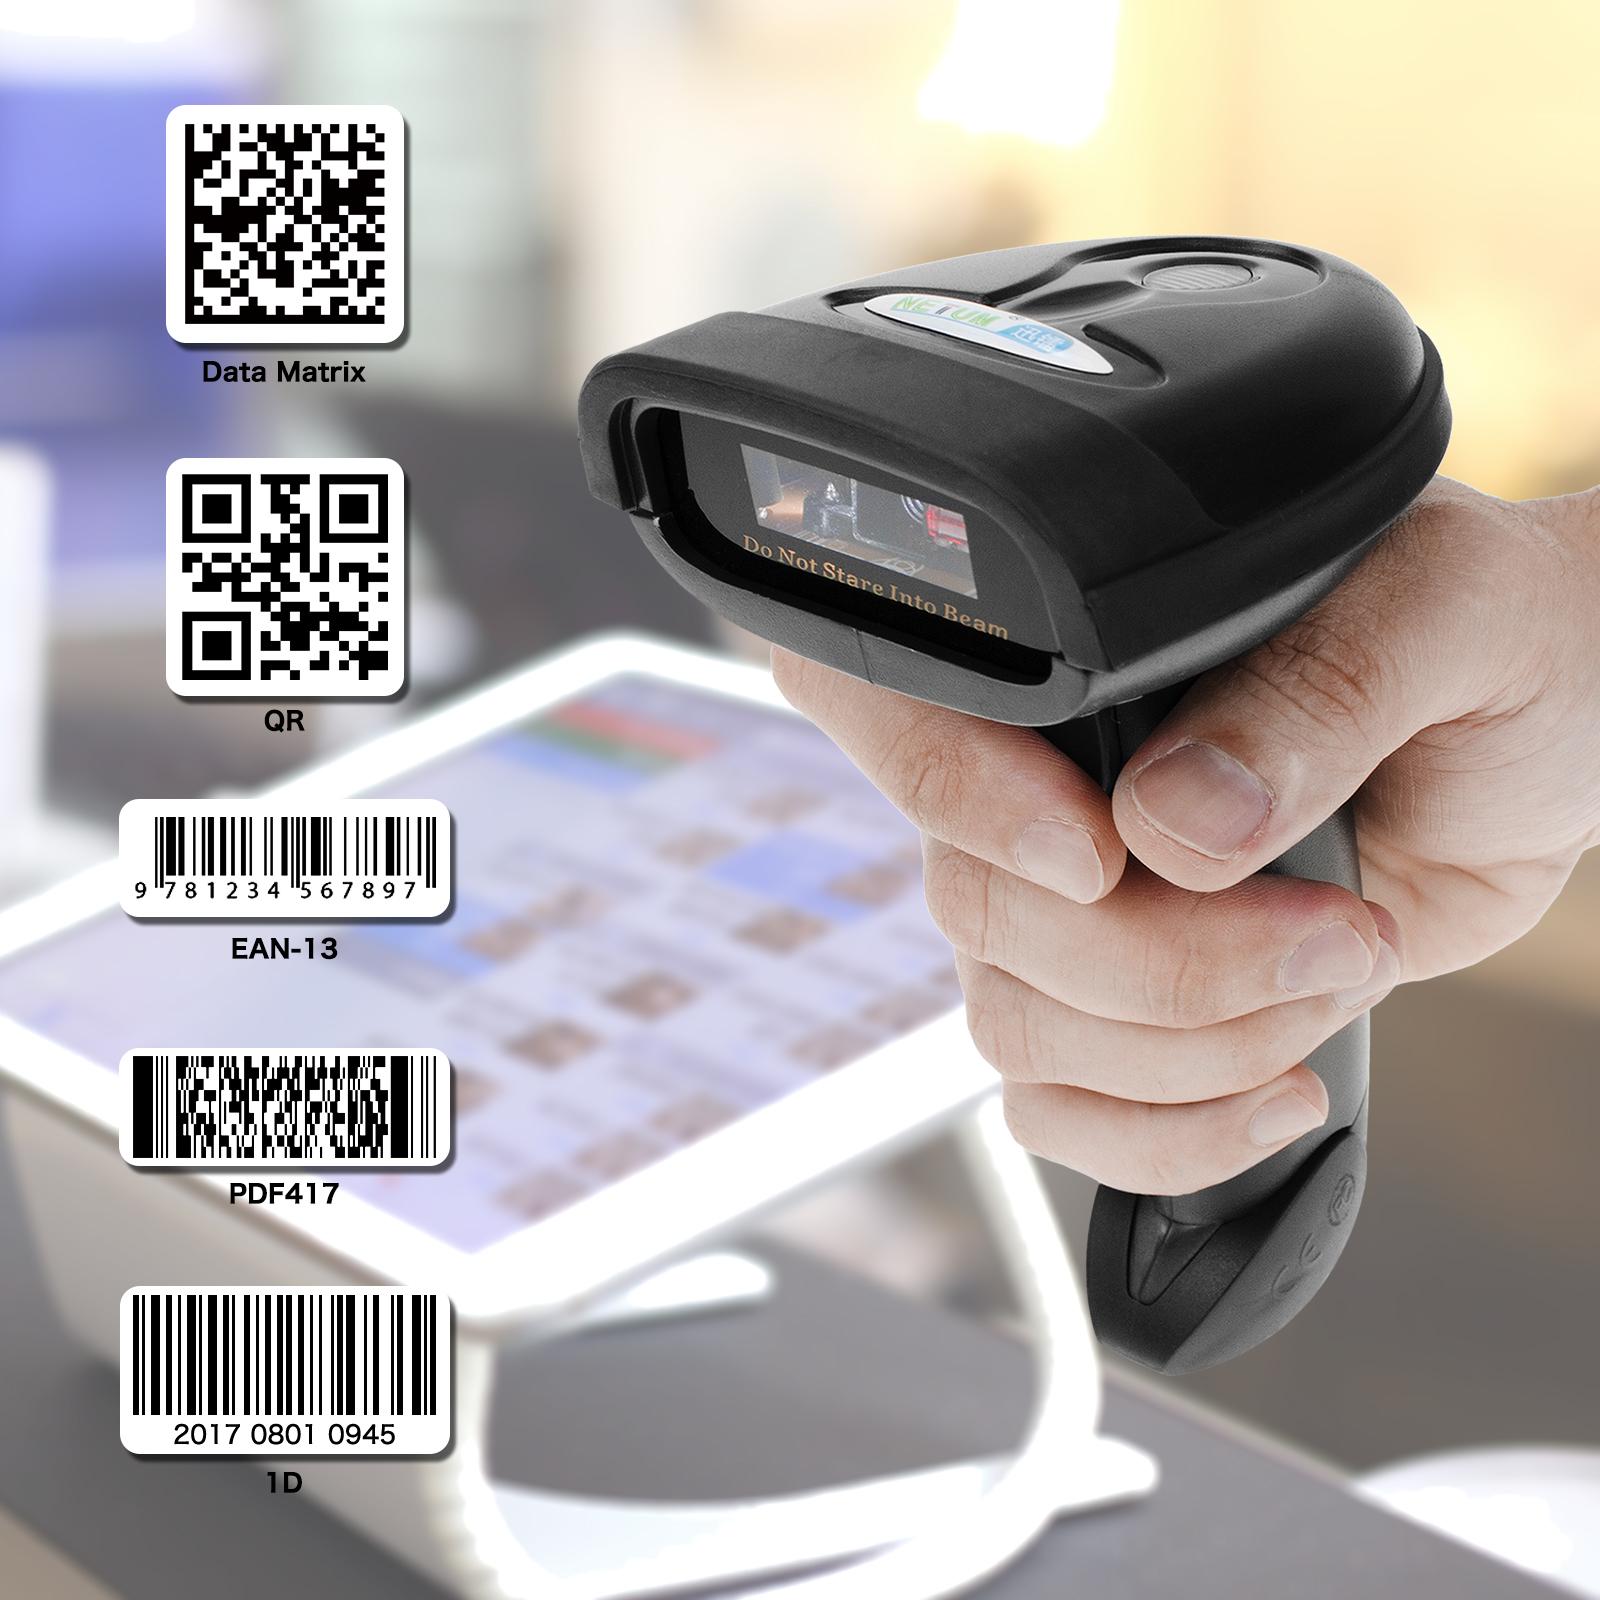 Auto Barcode Scanner